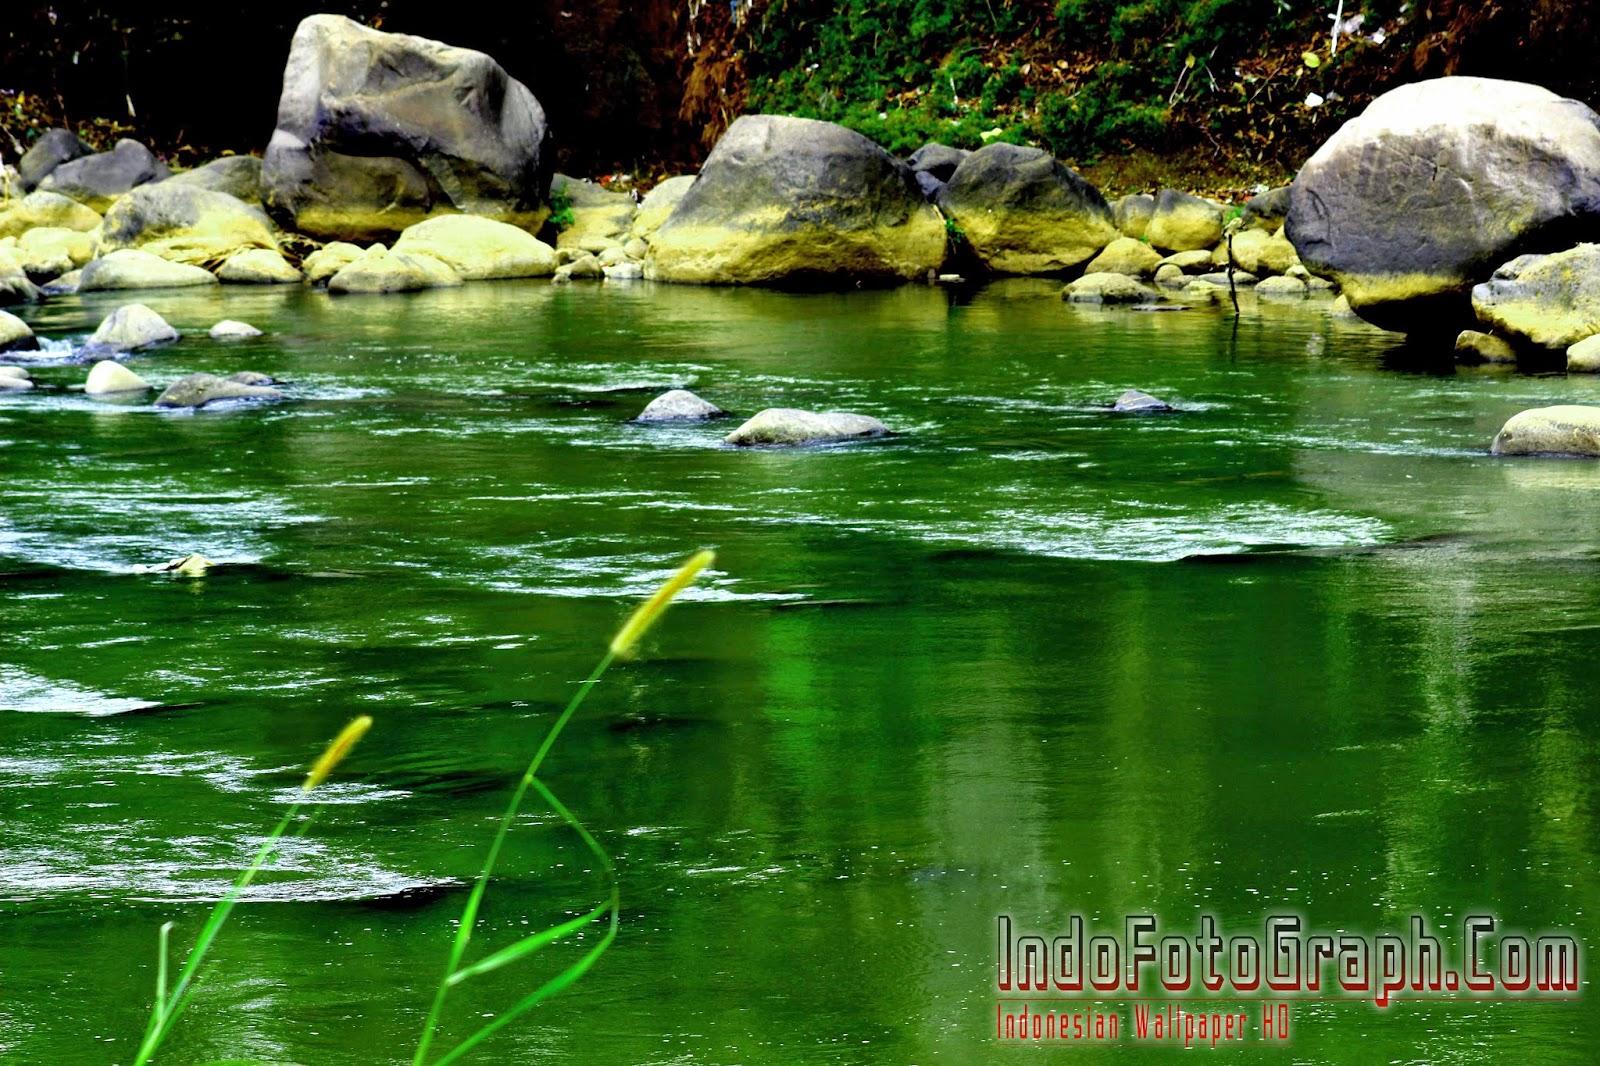 Pemandangan Alam Sungai Pemandanganoce